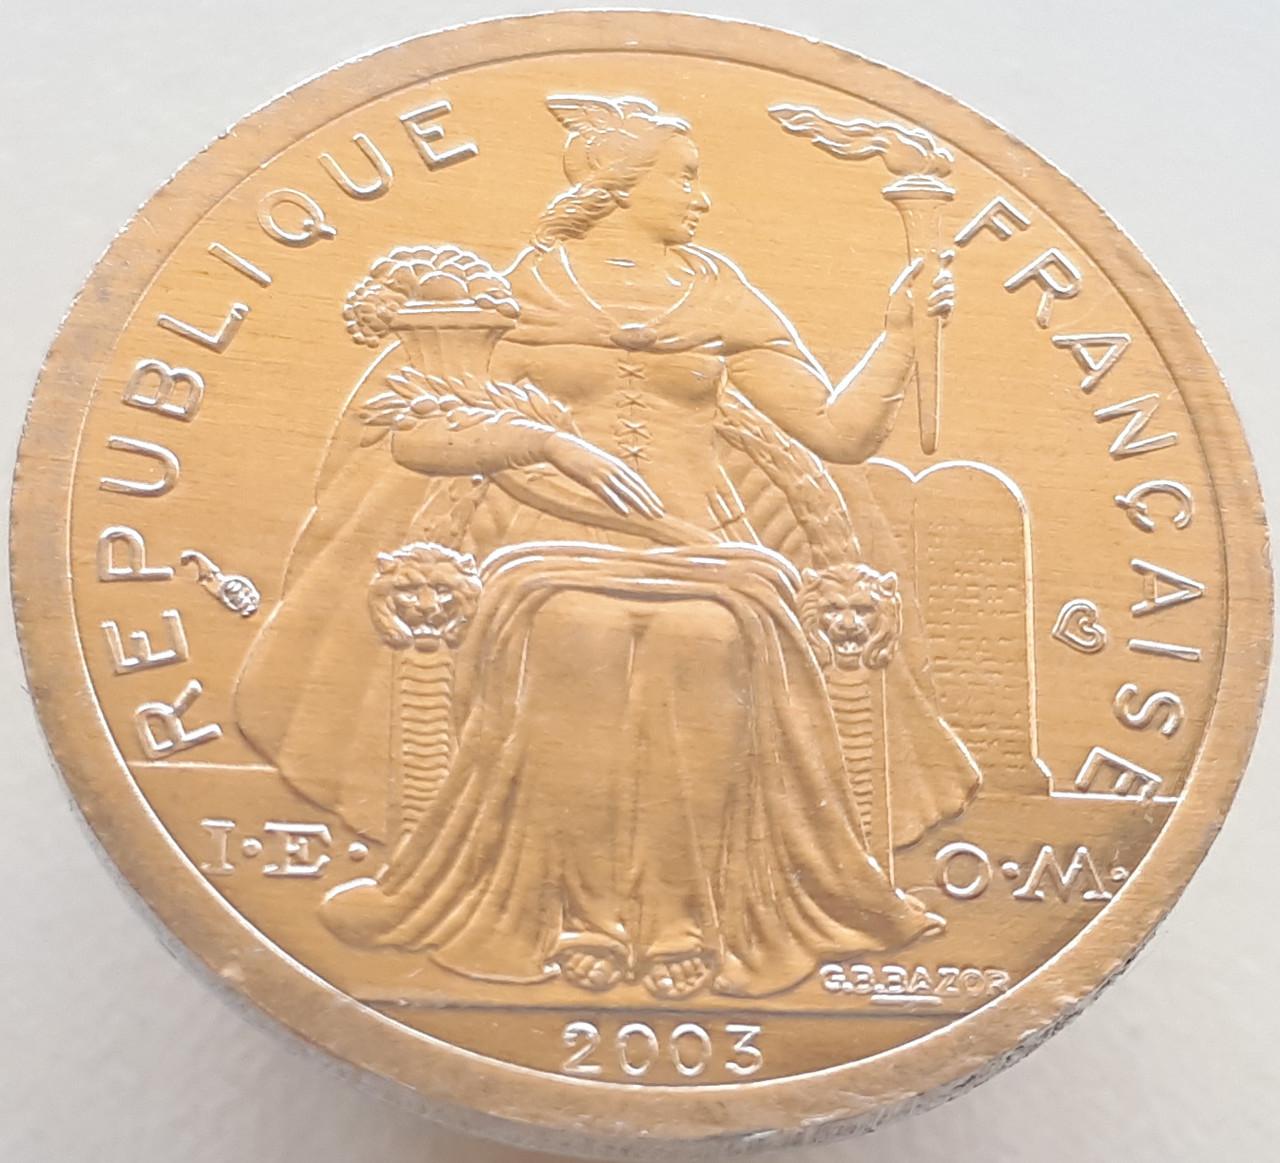 Французька Полінезія 1 франк 2003